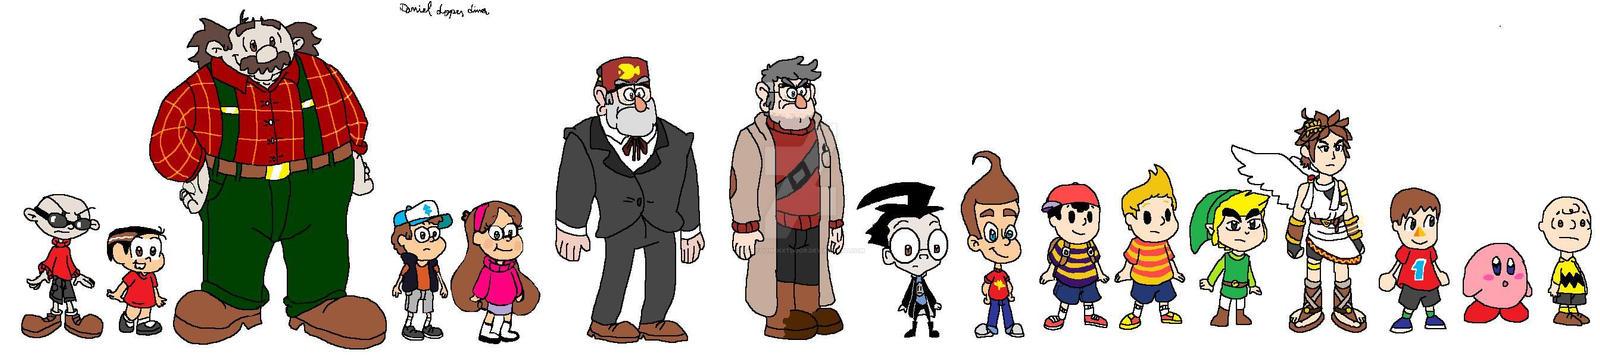 Characters in my drawing style by Cartoonenxtdoor